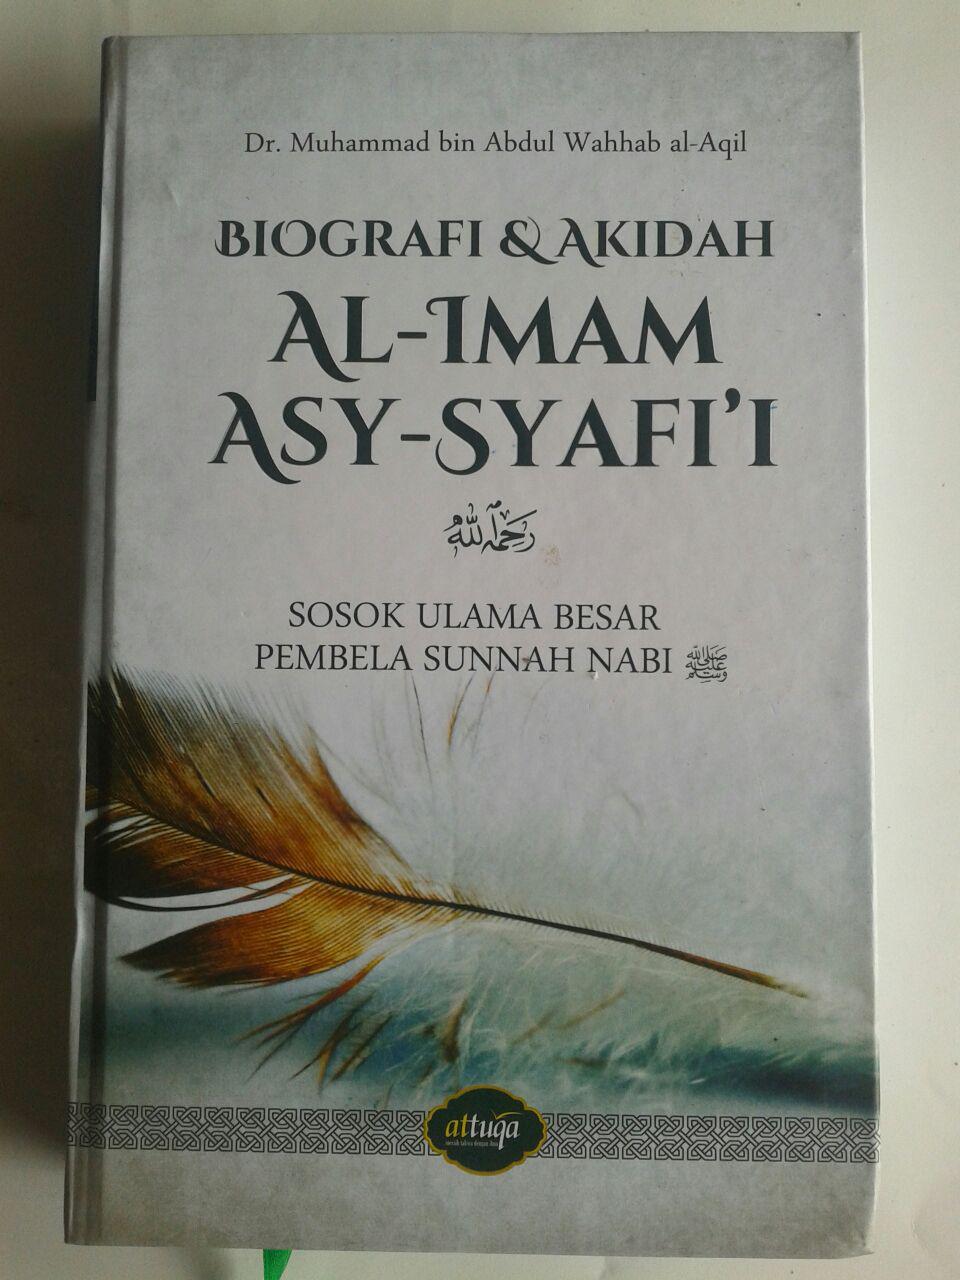 Buku Biografi Dan Akidah Al-Imam Asy-Syafi'i cover 2